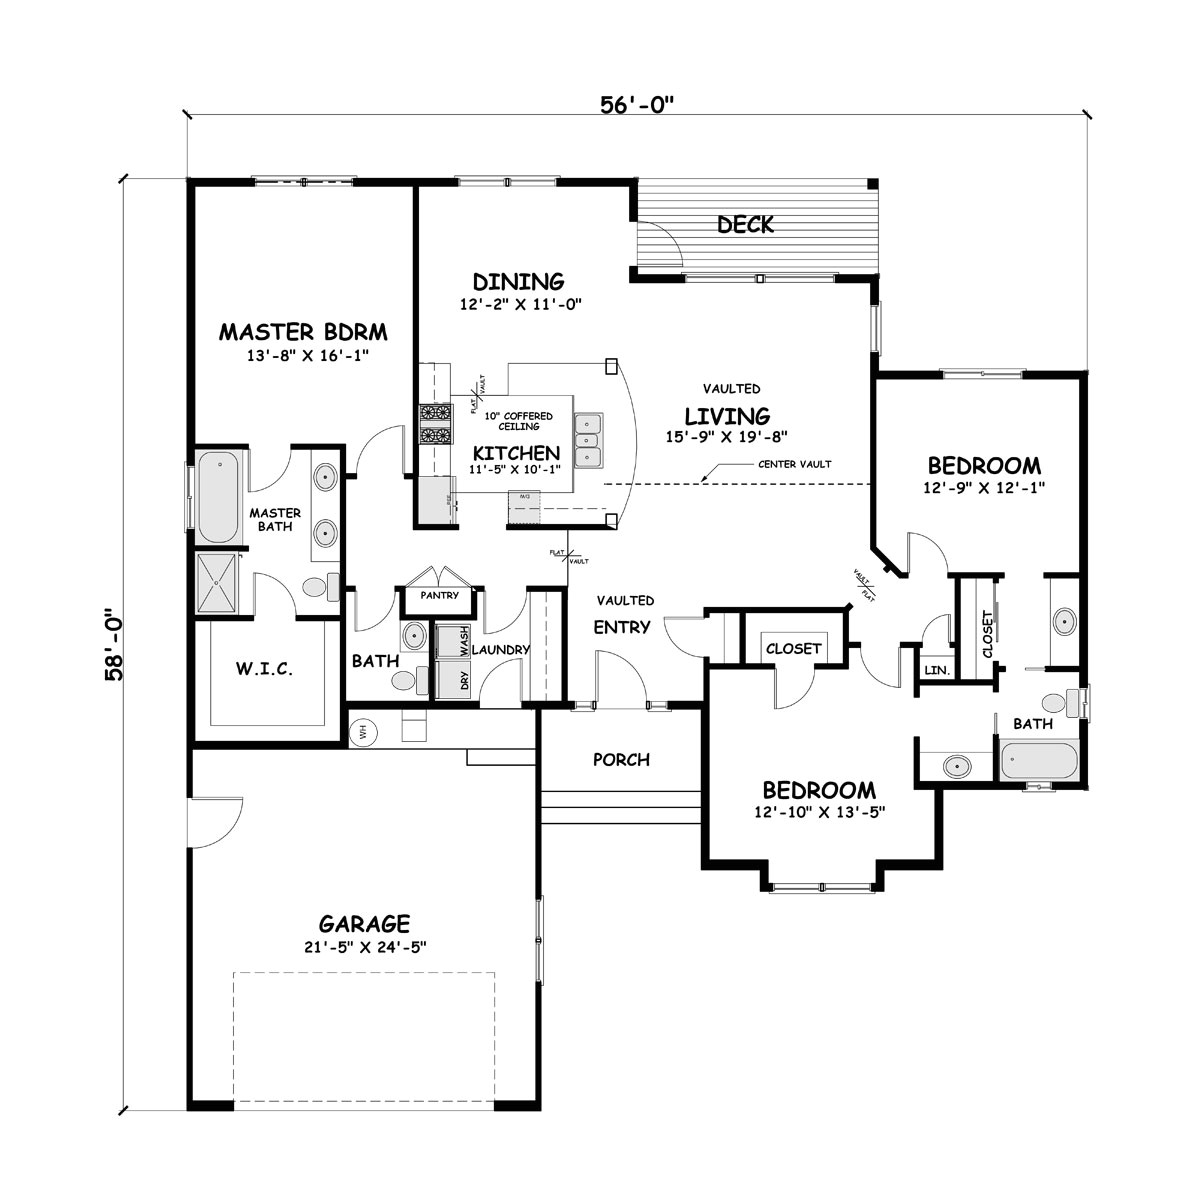 Designed Home Plans Buildings Plans and Designs Homes Floor Plans